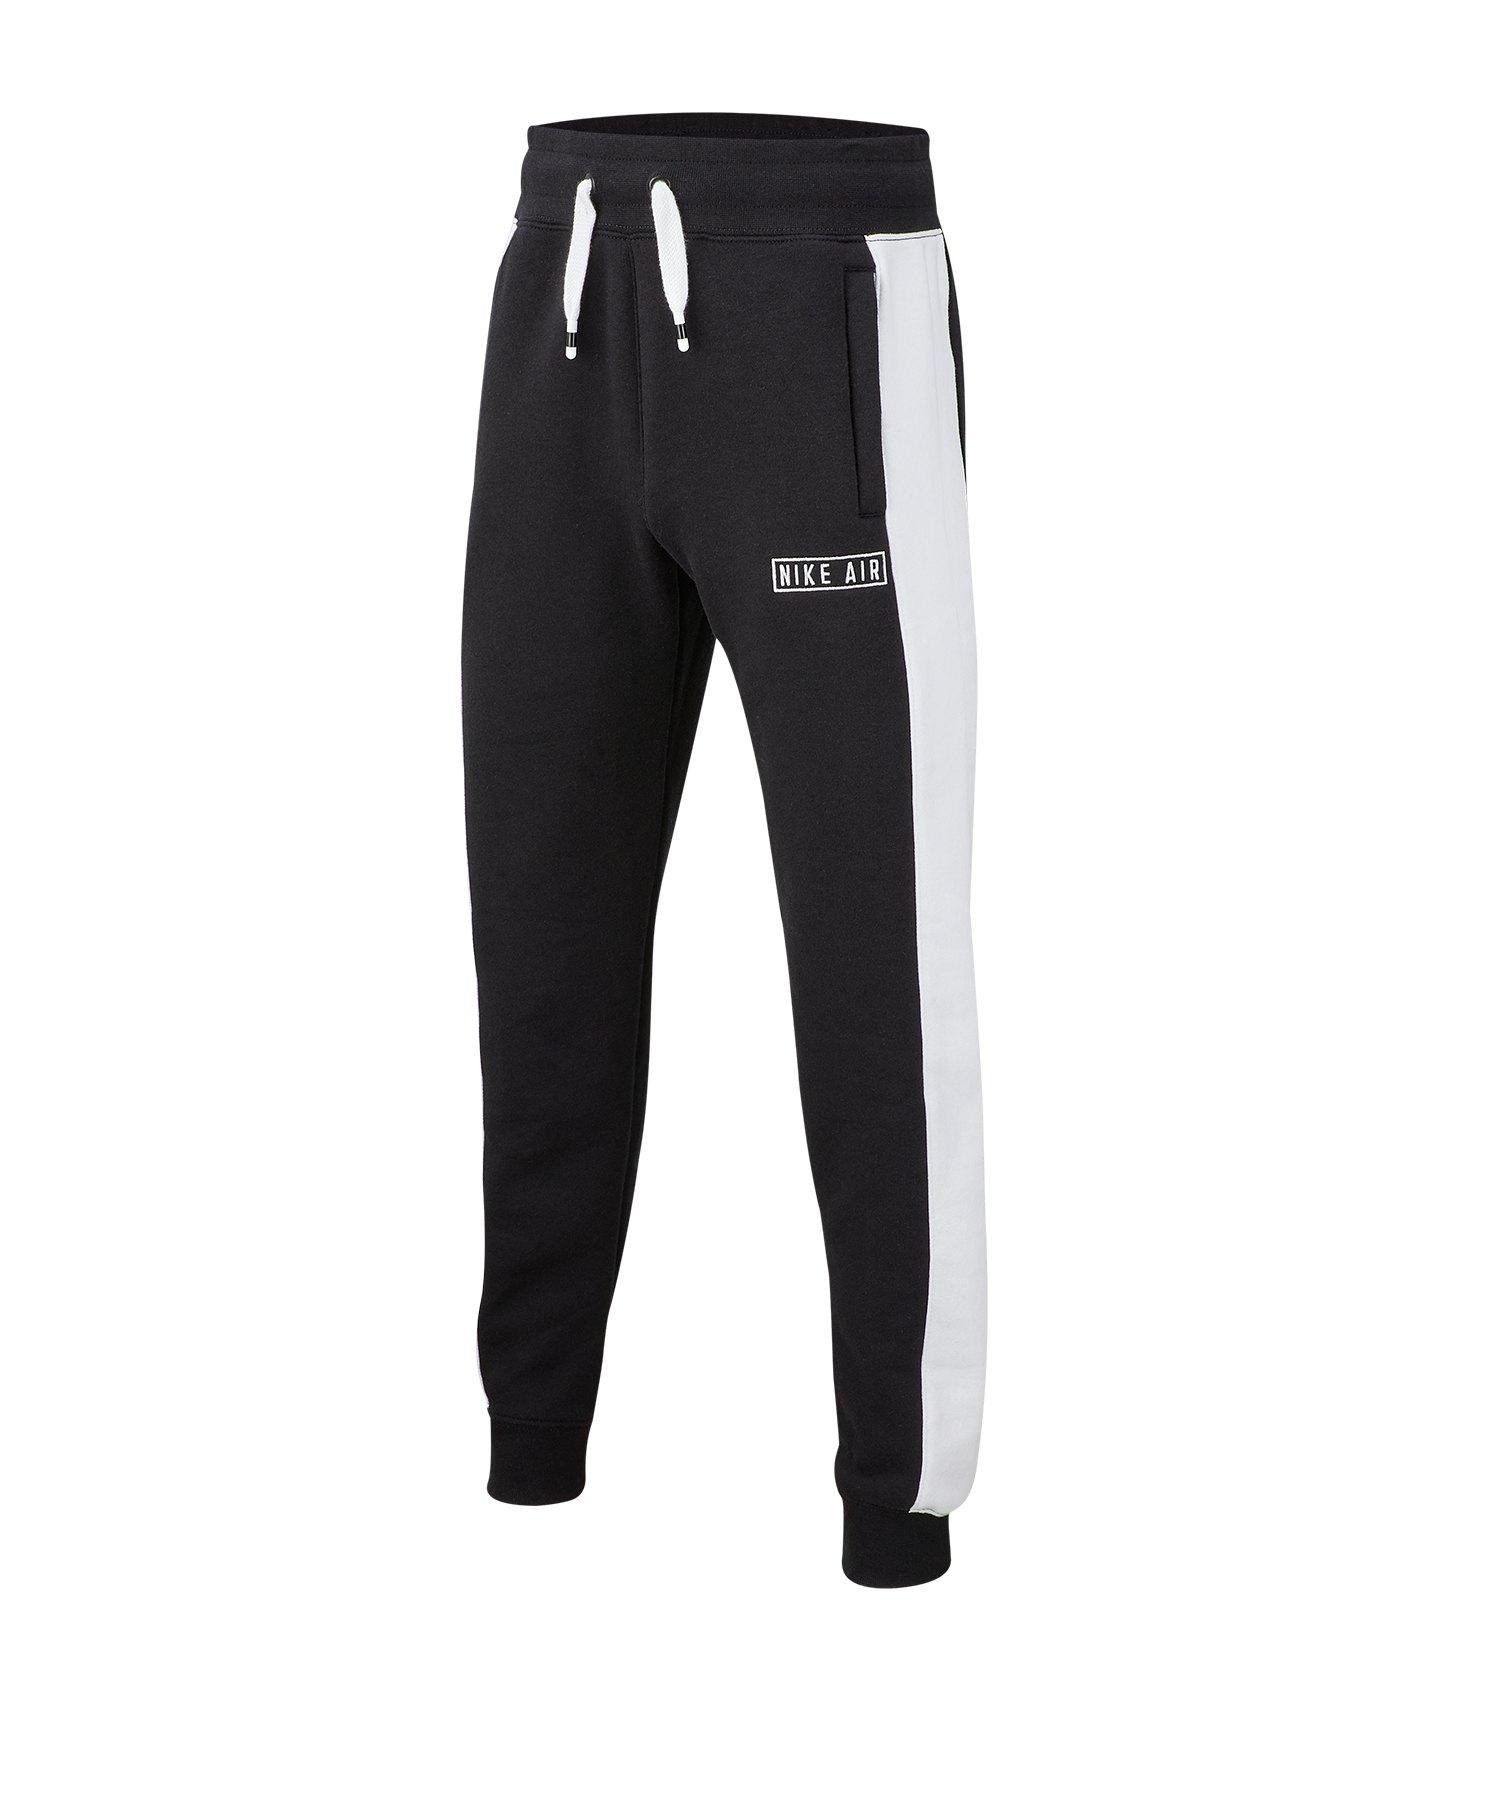 Nike Air Pant Jogginghose Kids Schwarz F010 - schwarz